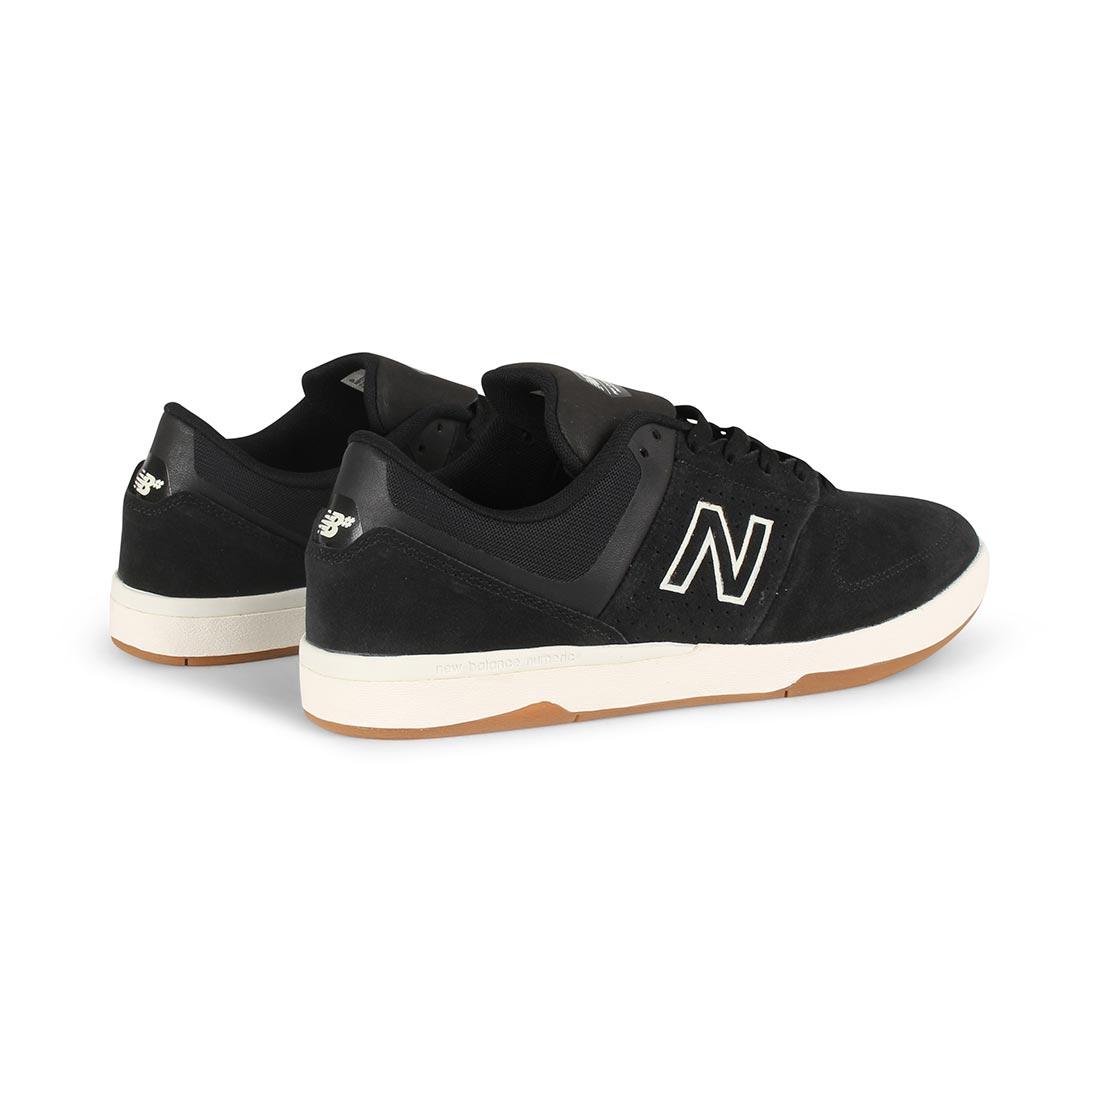 New Balance Numeric PJ Ladd 533 v2 - Black / Gum